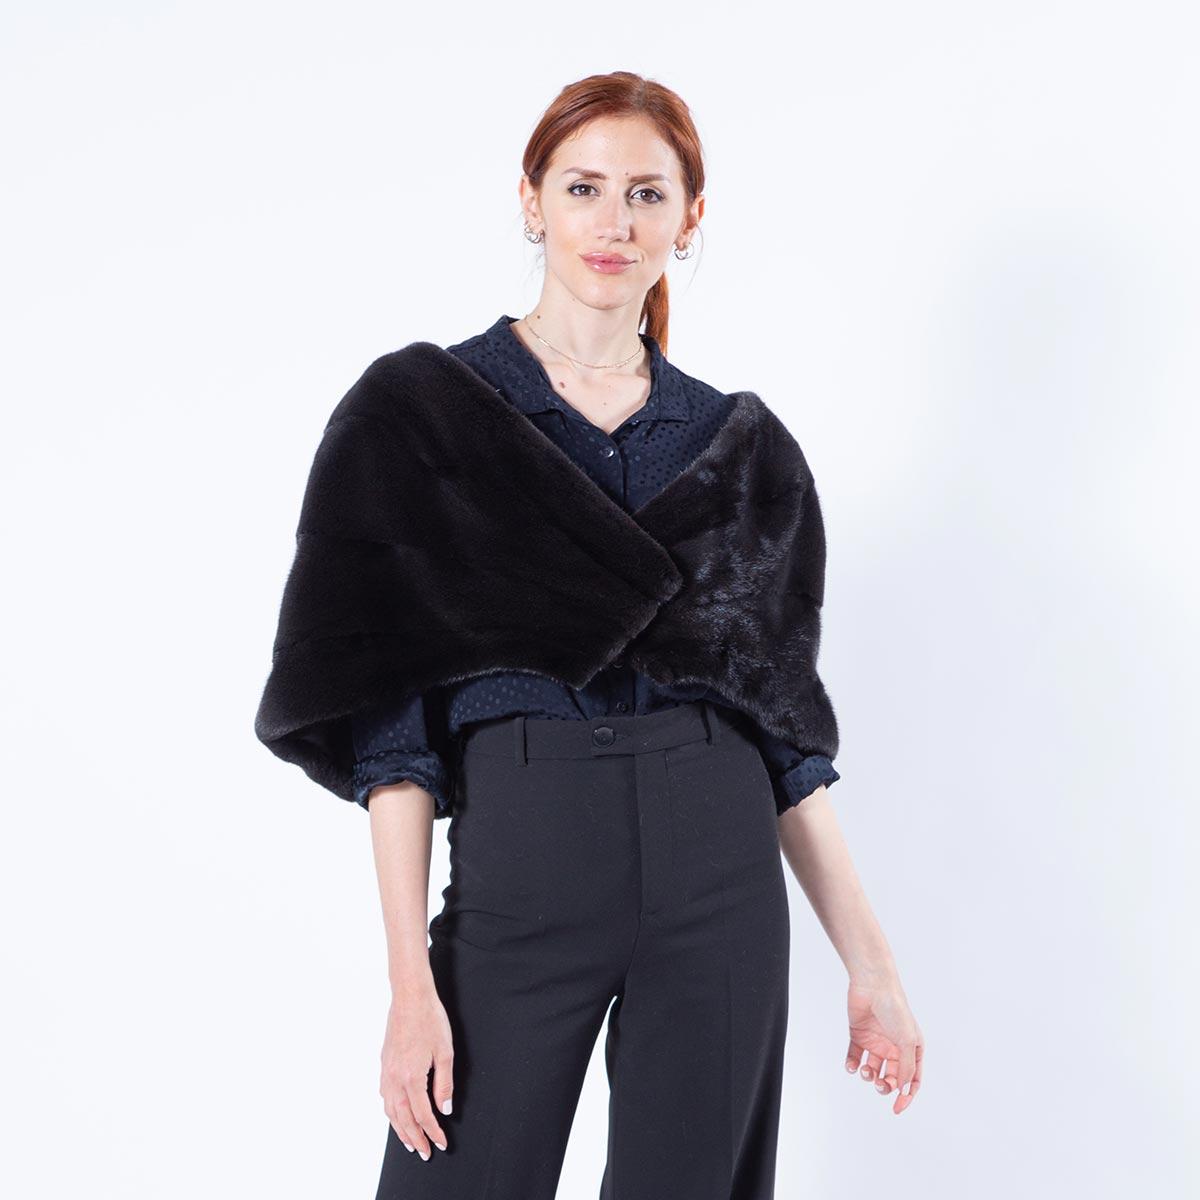 Luxurious Blackglama Mink Fur Stole | Меховой палантин из норки Blackglama - Sarigianni Furs